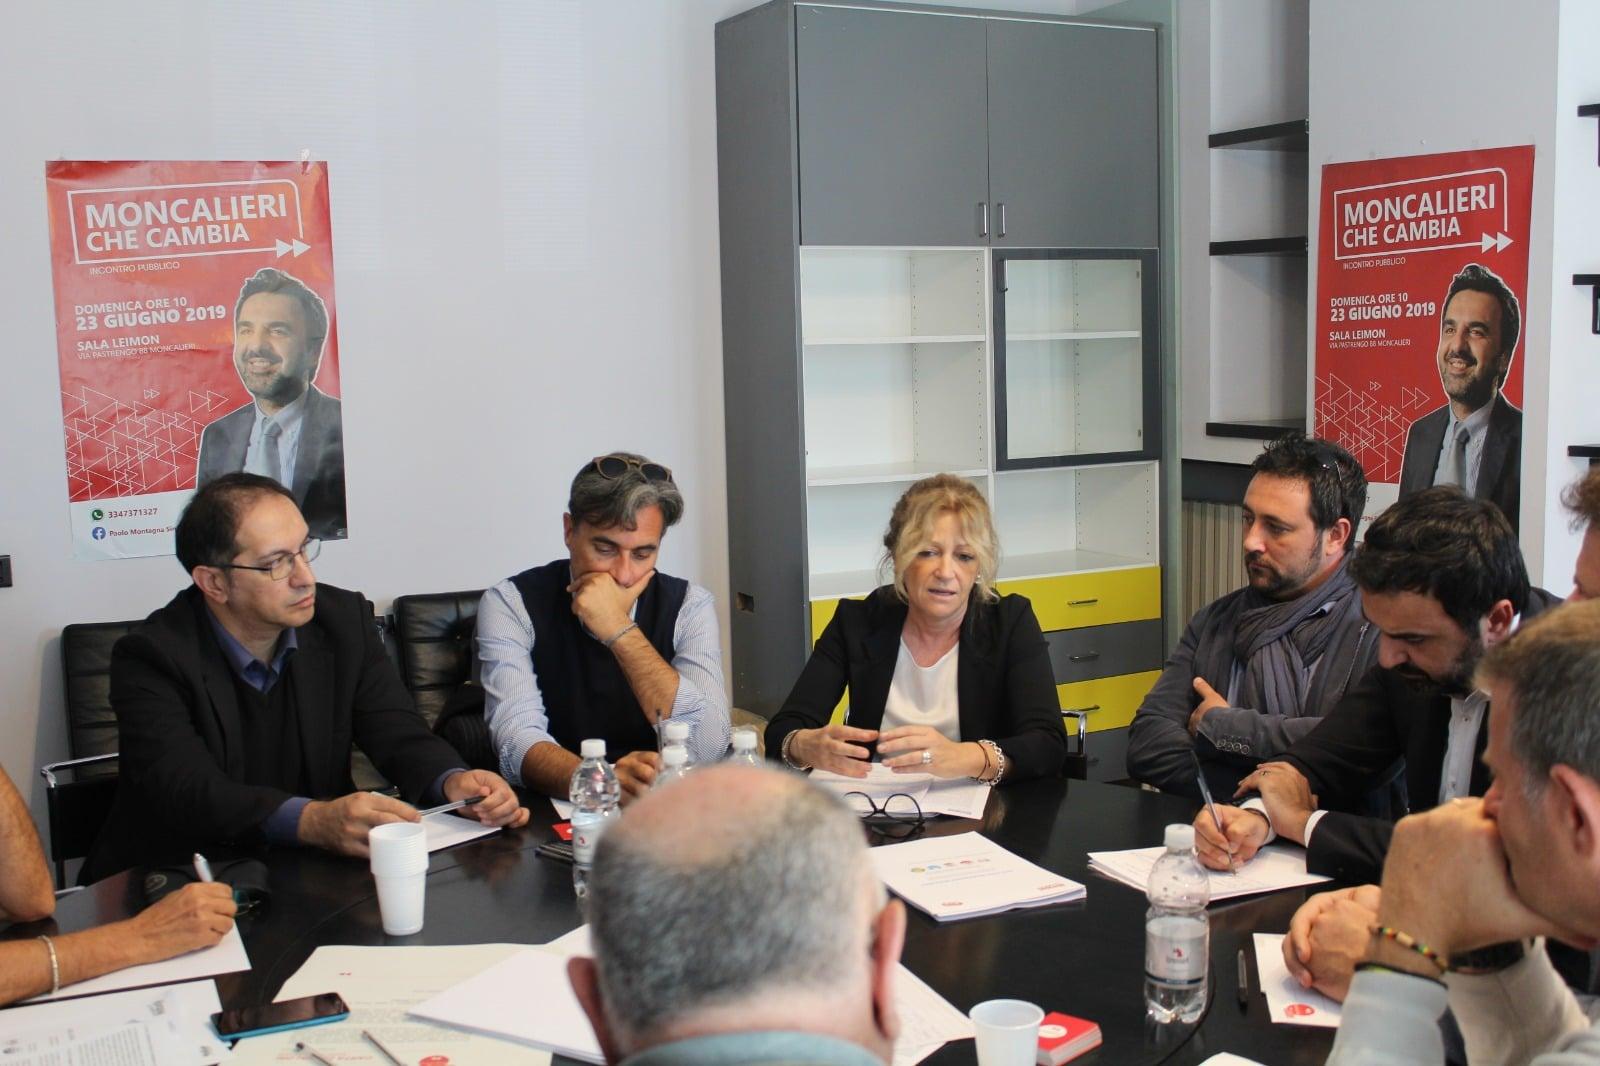 Incontro DemoS SIndaco Moncalieri